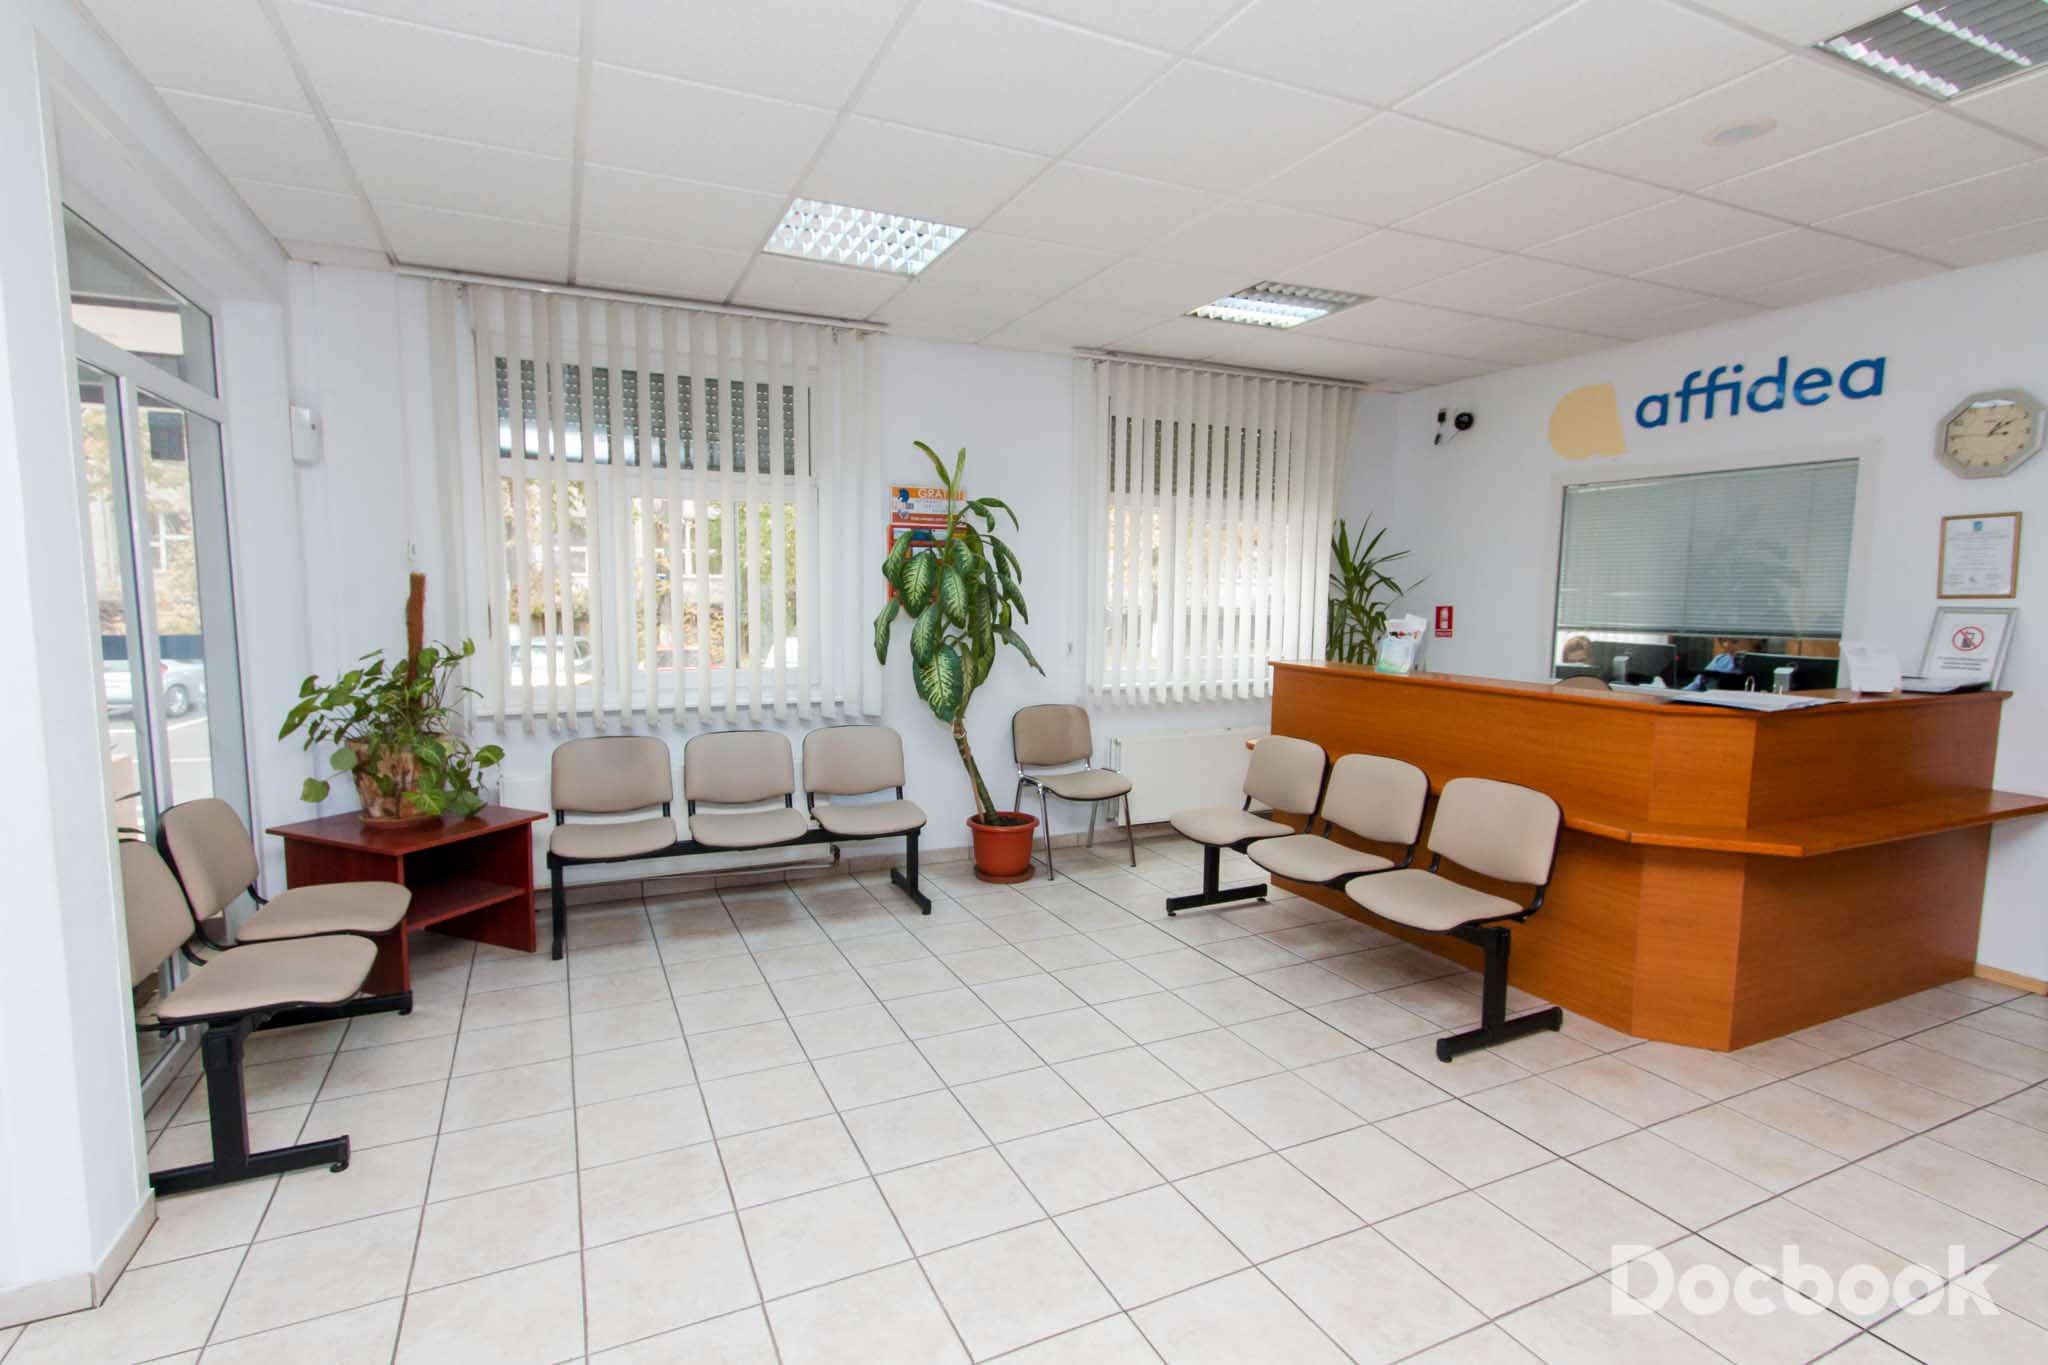 Clinica Affidea - Constanta